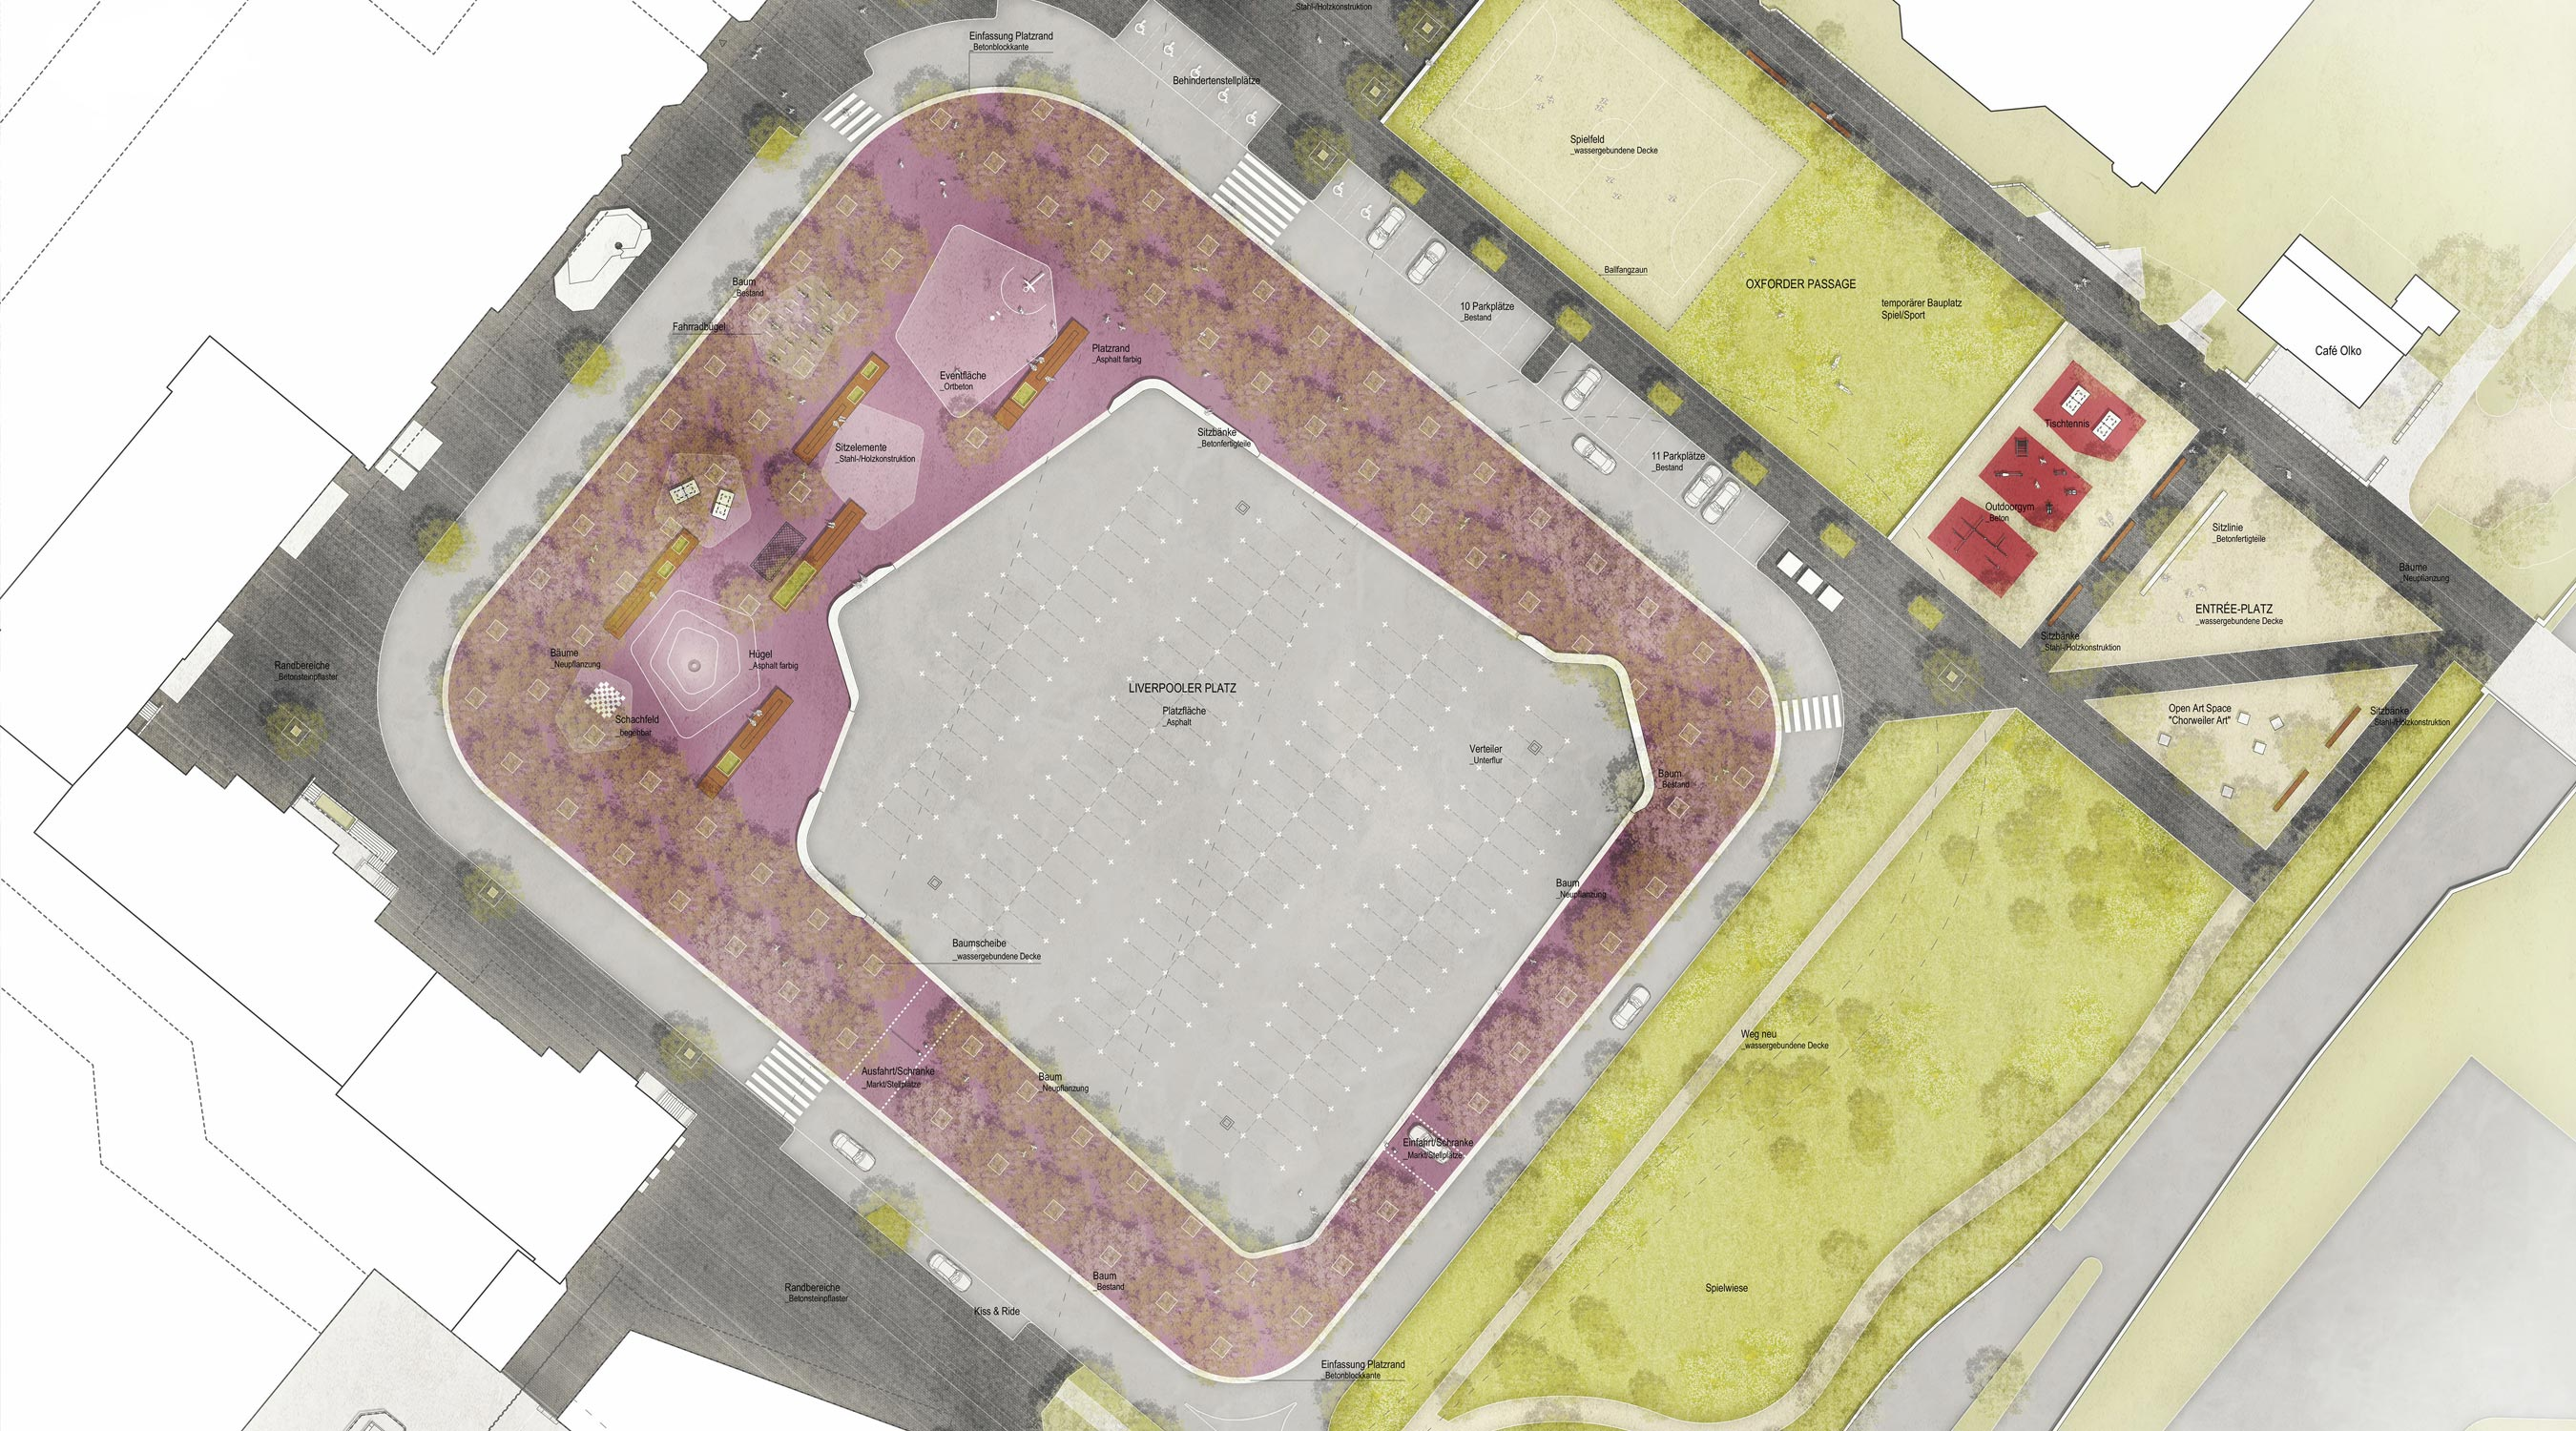 Köln Lebenswertes Chorweiler Lageplan Liverpooler Platz